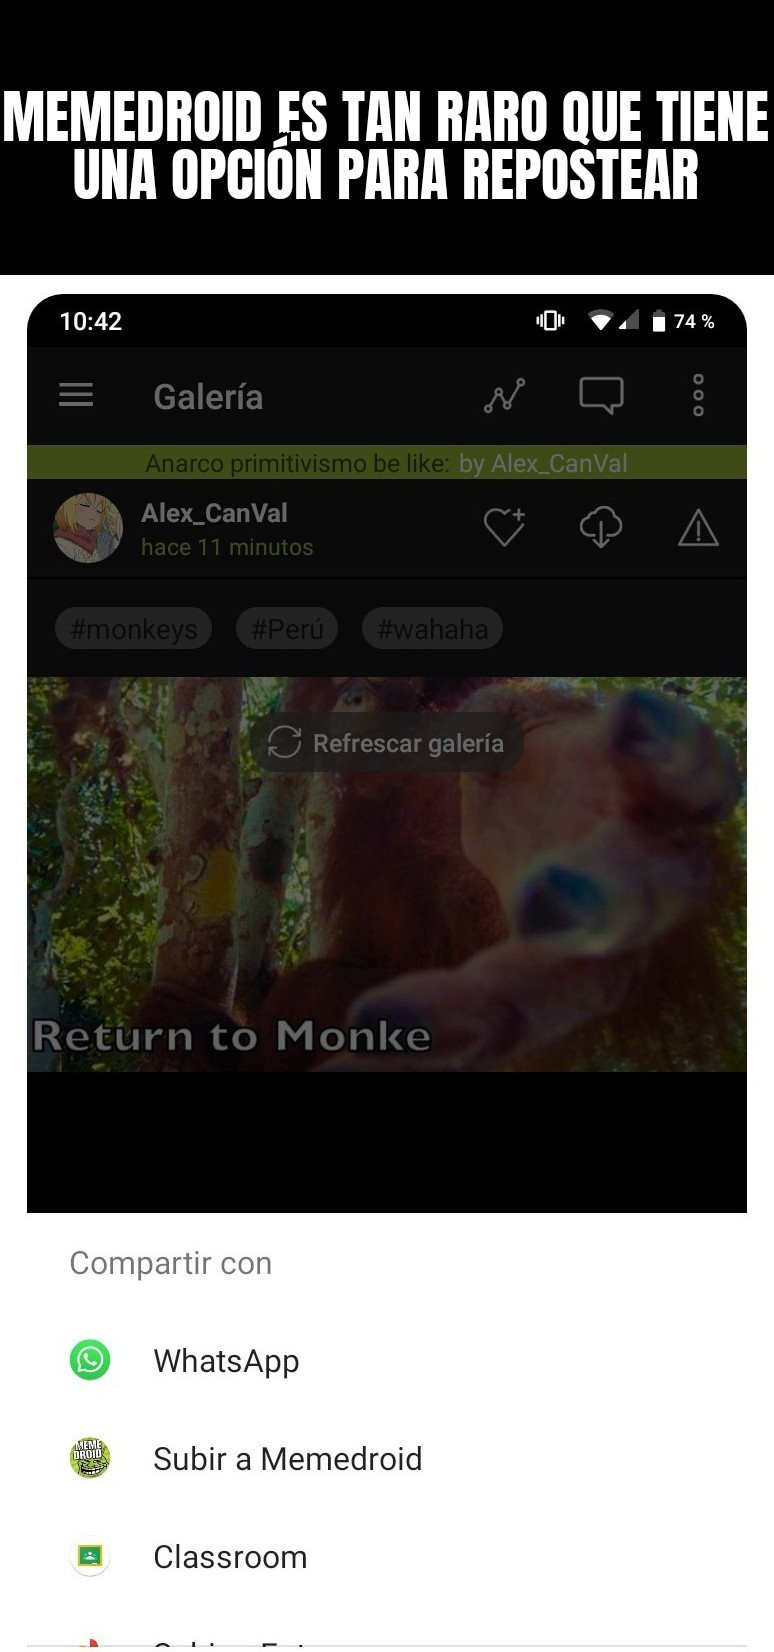 Acepten porfa original - meme